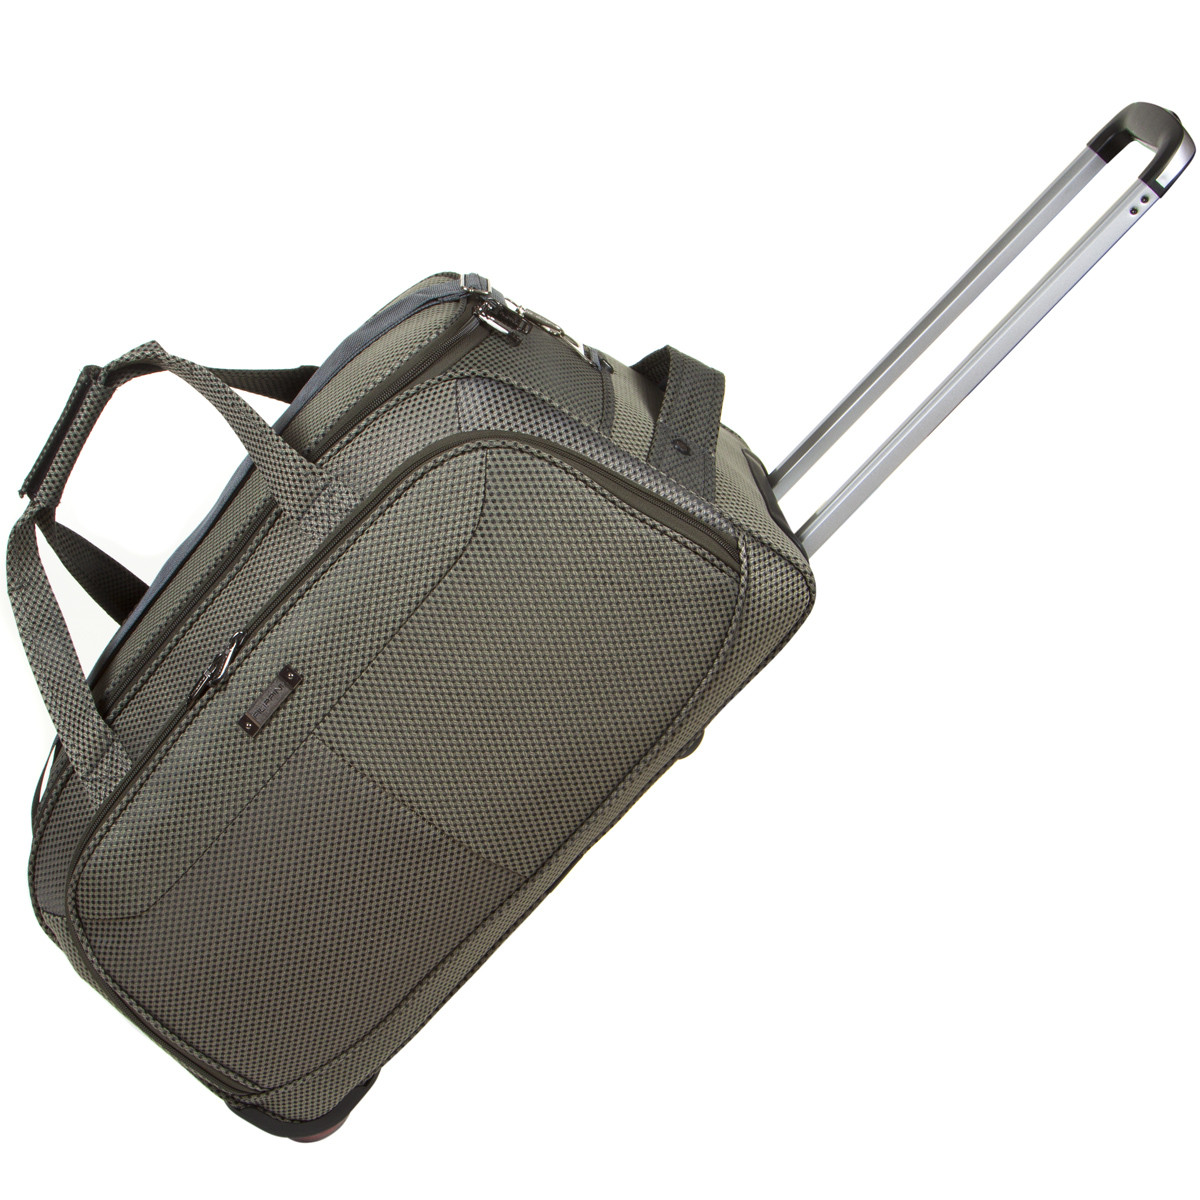 Дорожная сумка FILIPPINI большая  67х38х43 три колеса, выдвижная ручка цвет хаки ксТ0045хб